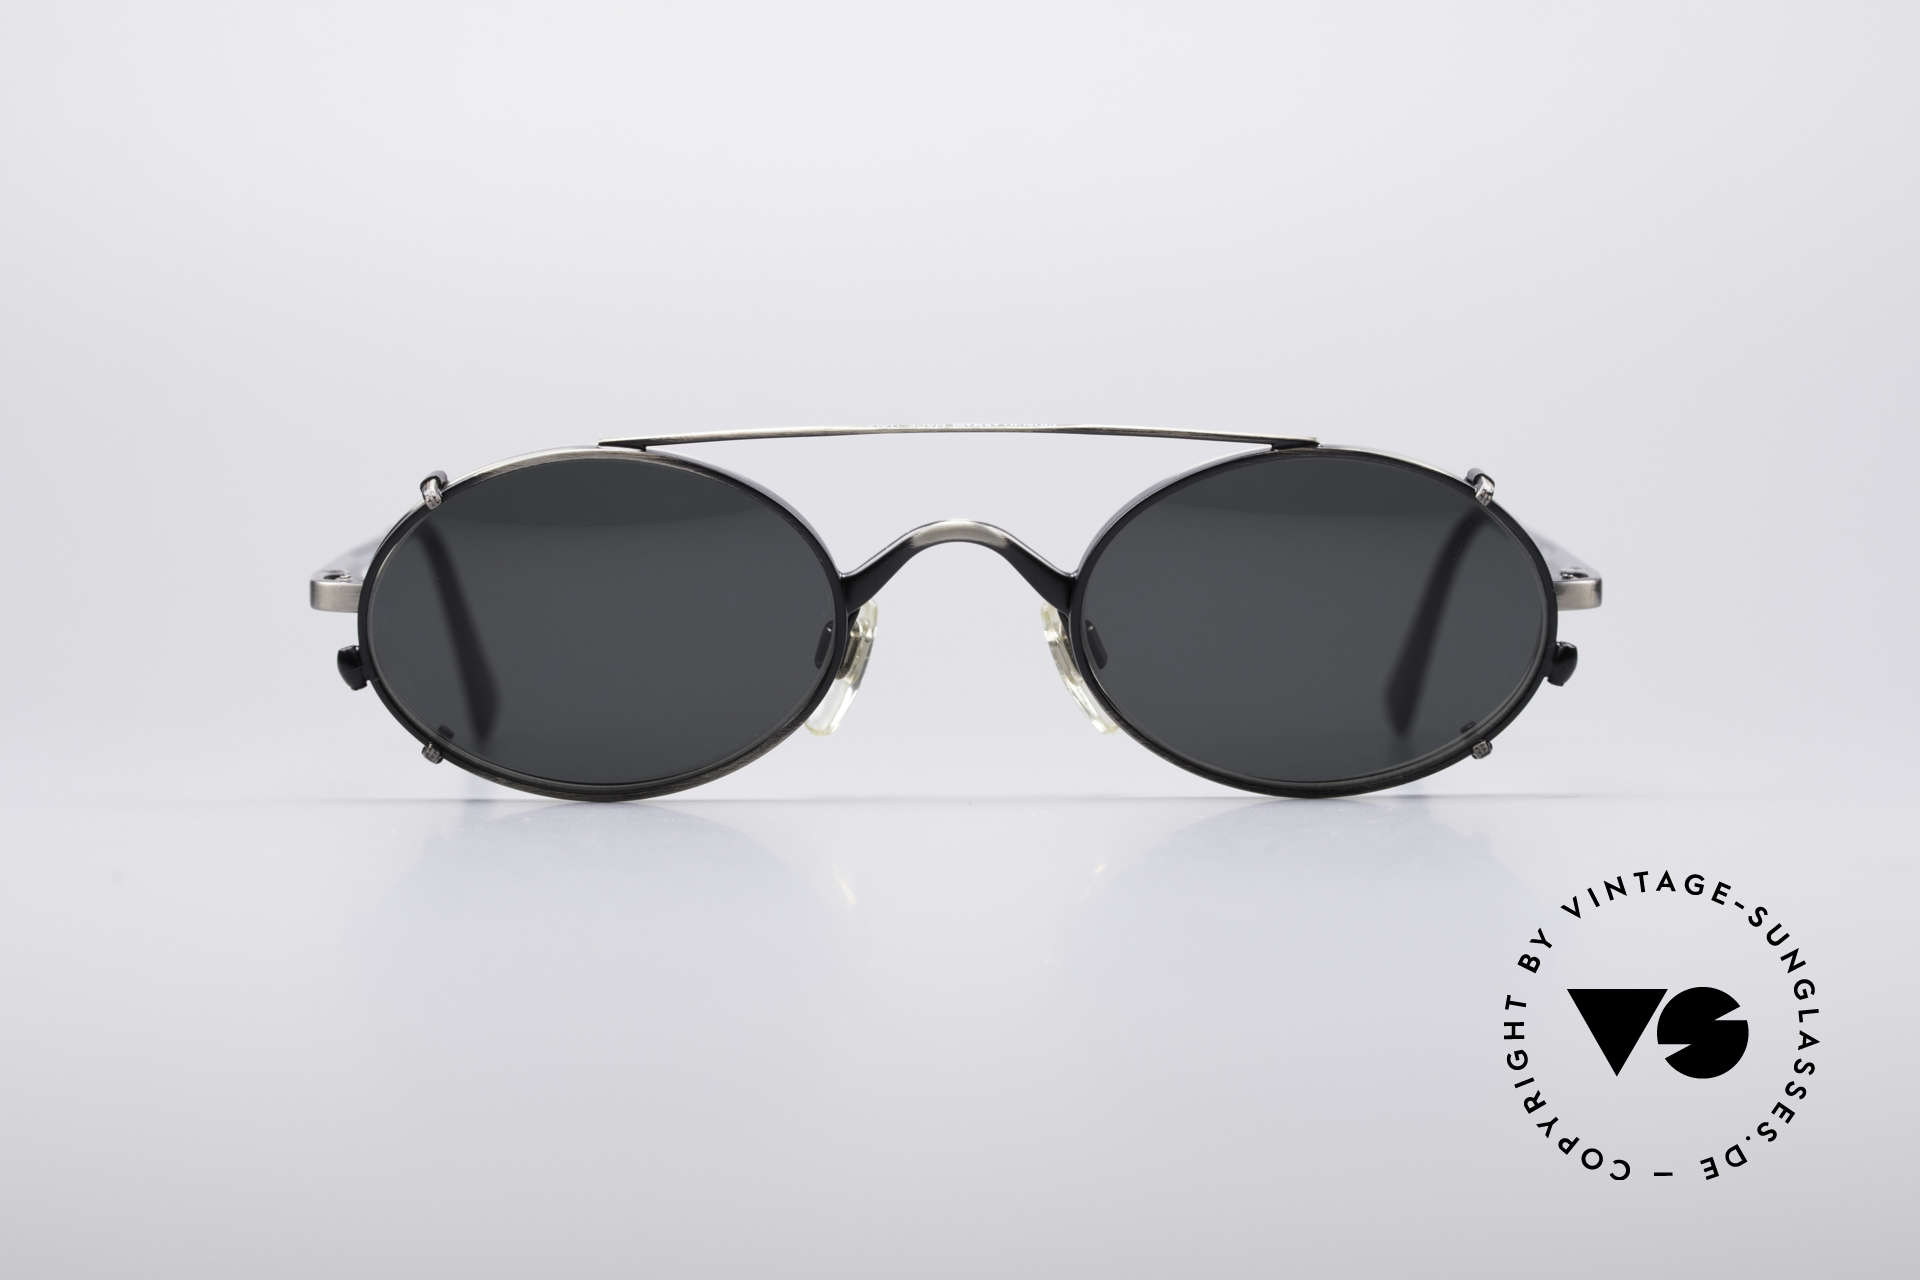 346a707ae9b0 Sunglasses Giorgio Armani 122 Clip On Vintage Frame   Vintage Sunglasses